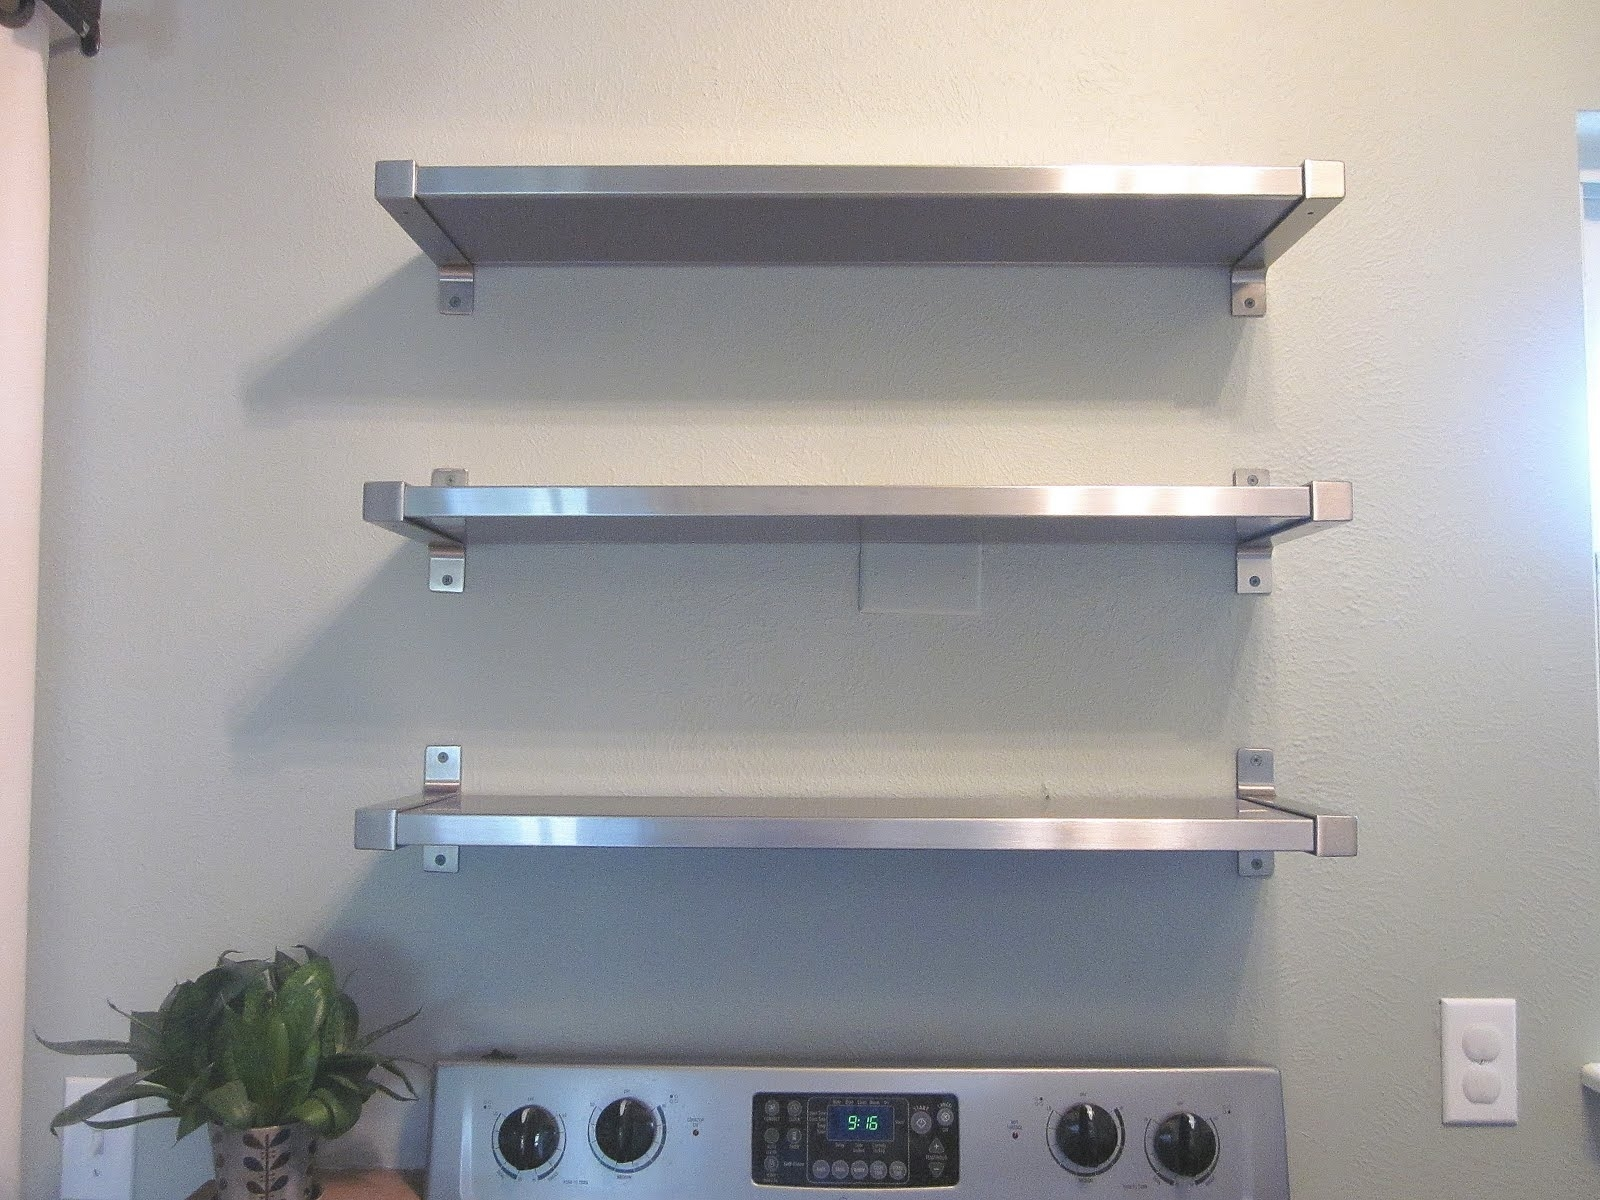 Floating Stainless Steel Kitchen Shelves Ideas On Foter